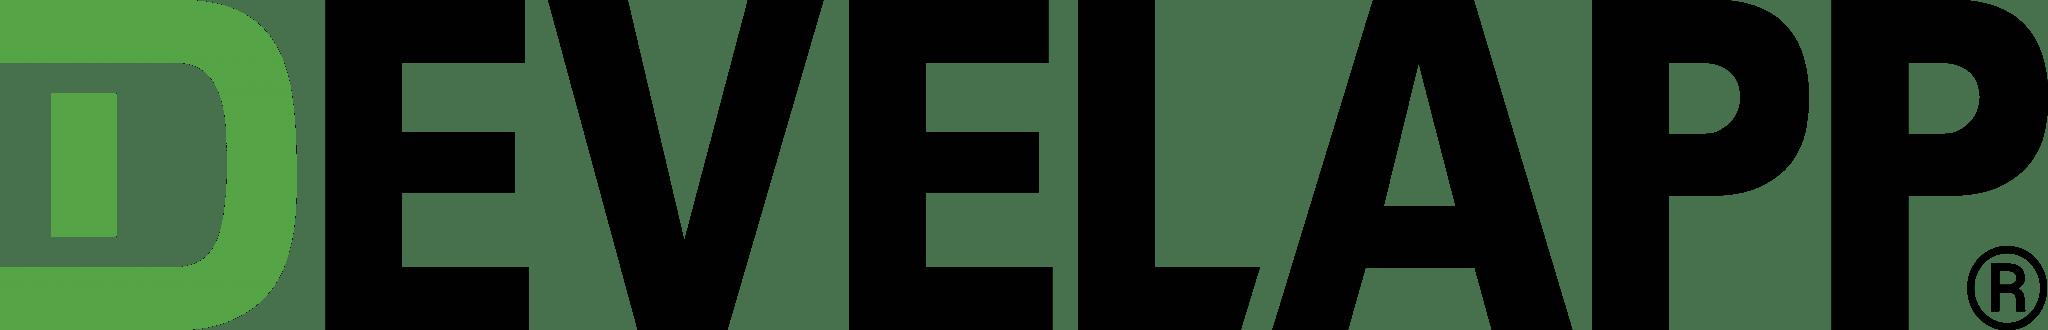 Develapp LLC Logo